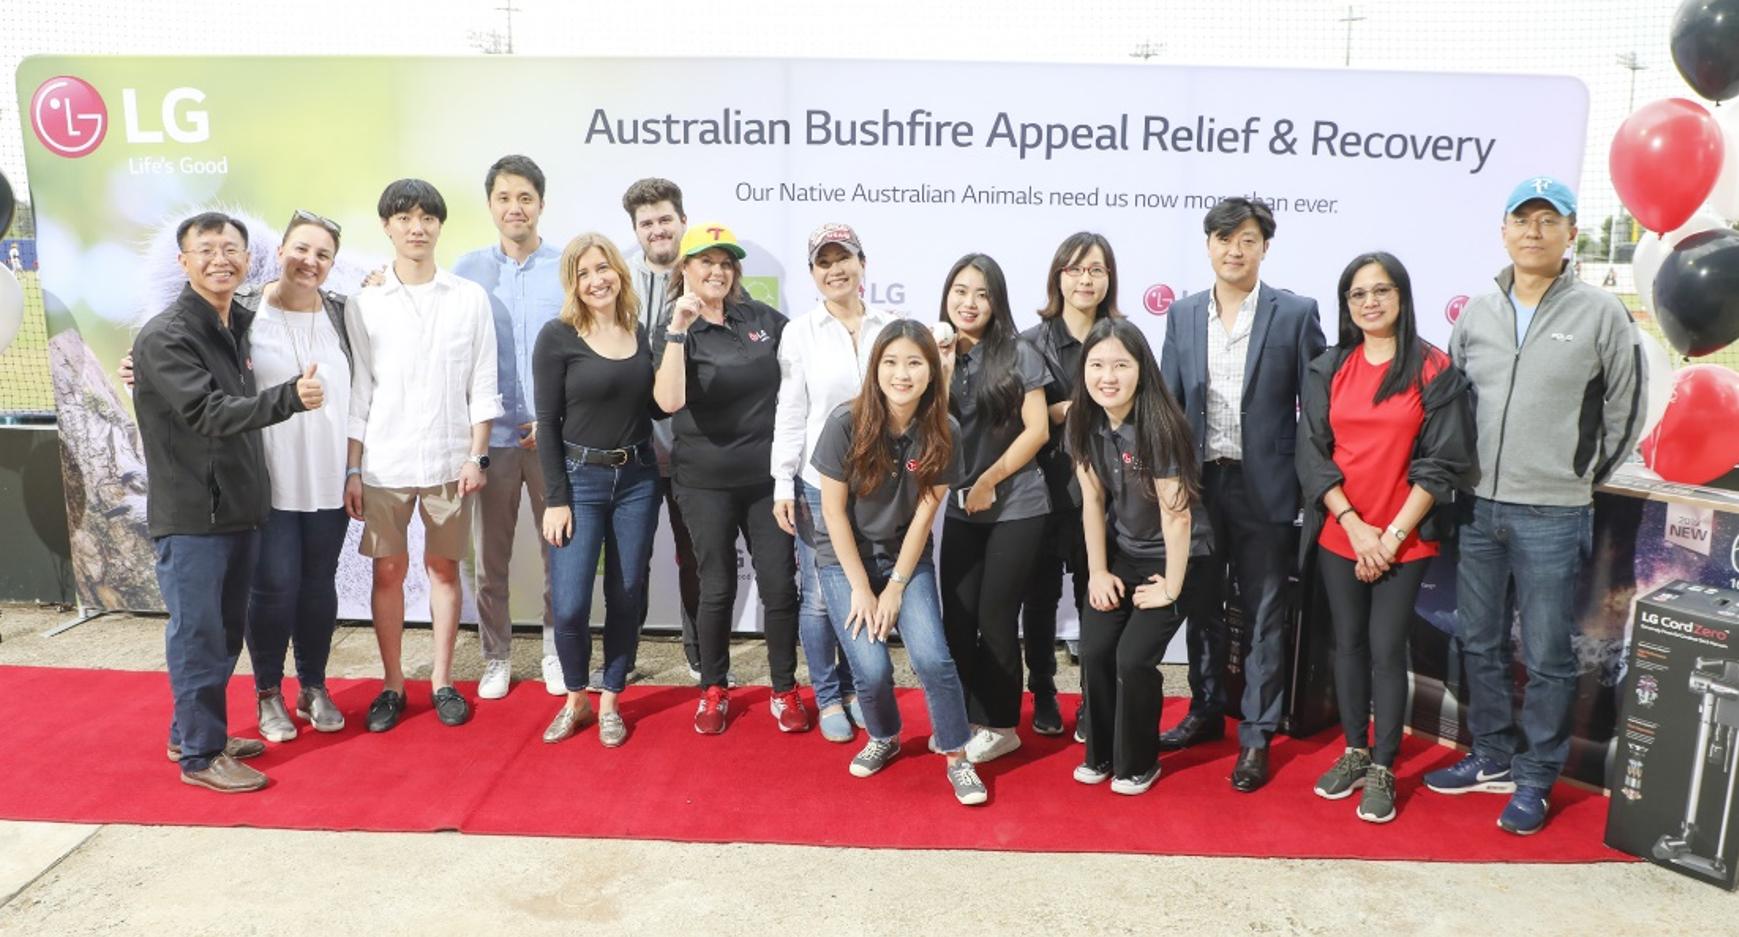 The LG Australia team pose for a group photo